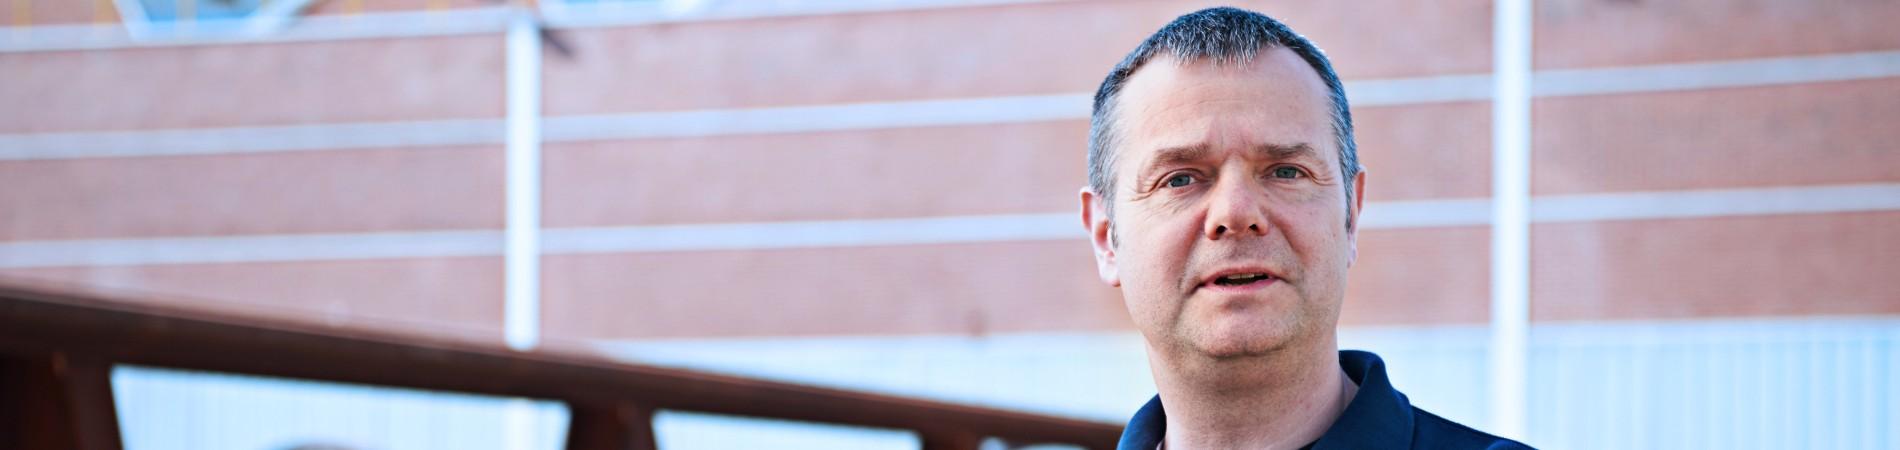 thyssenkrupp Bearings employee experience report Olaf Reinemann